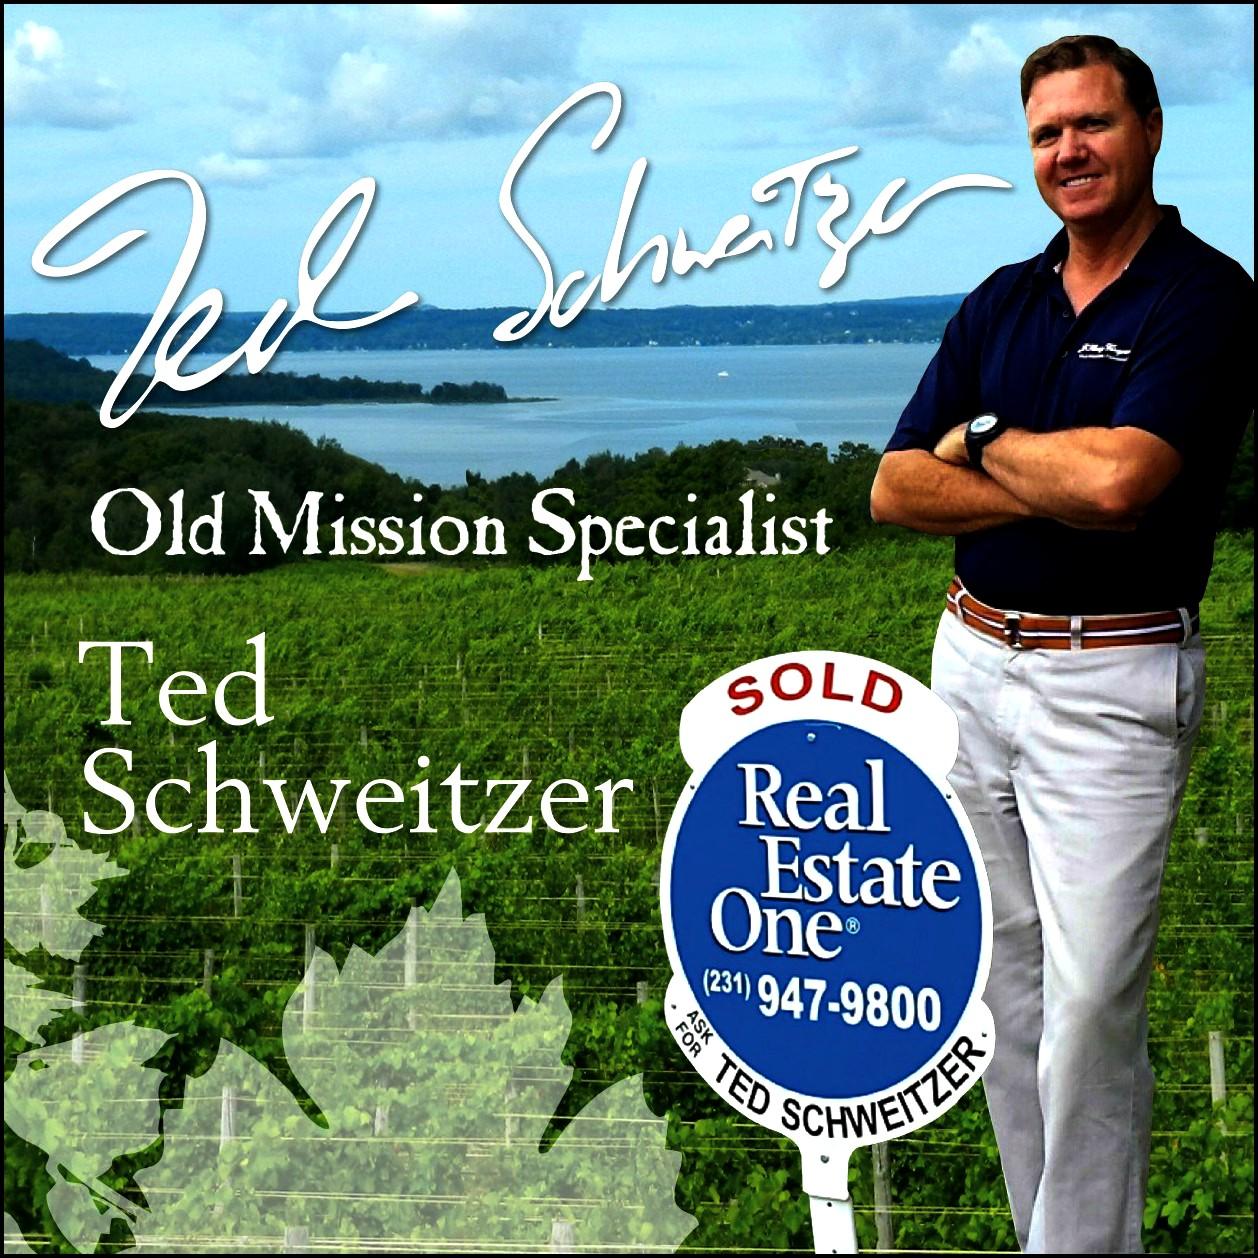 Ted Schweitzer